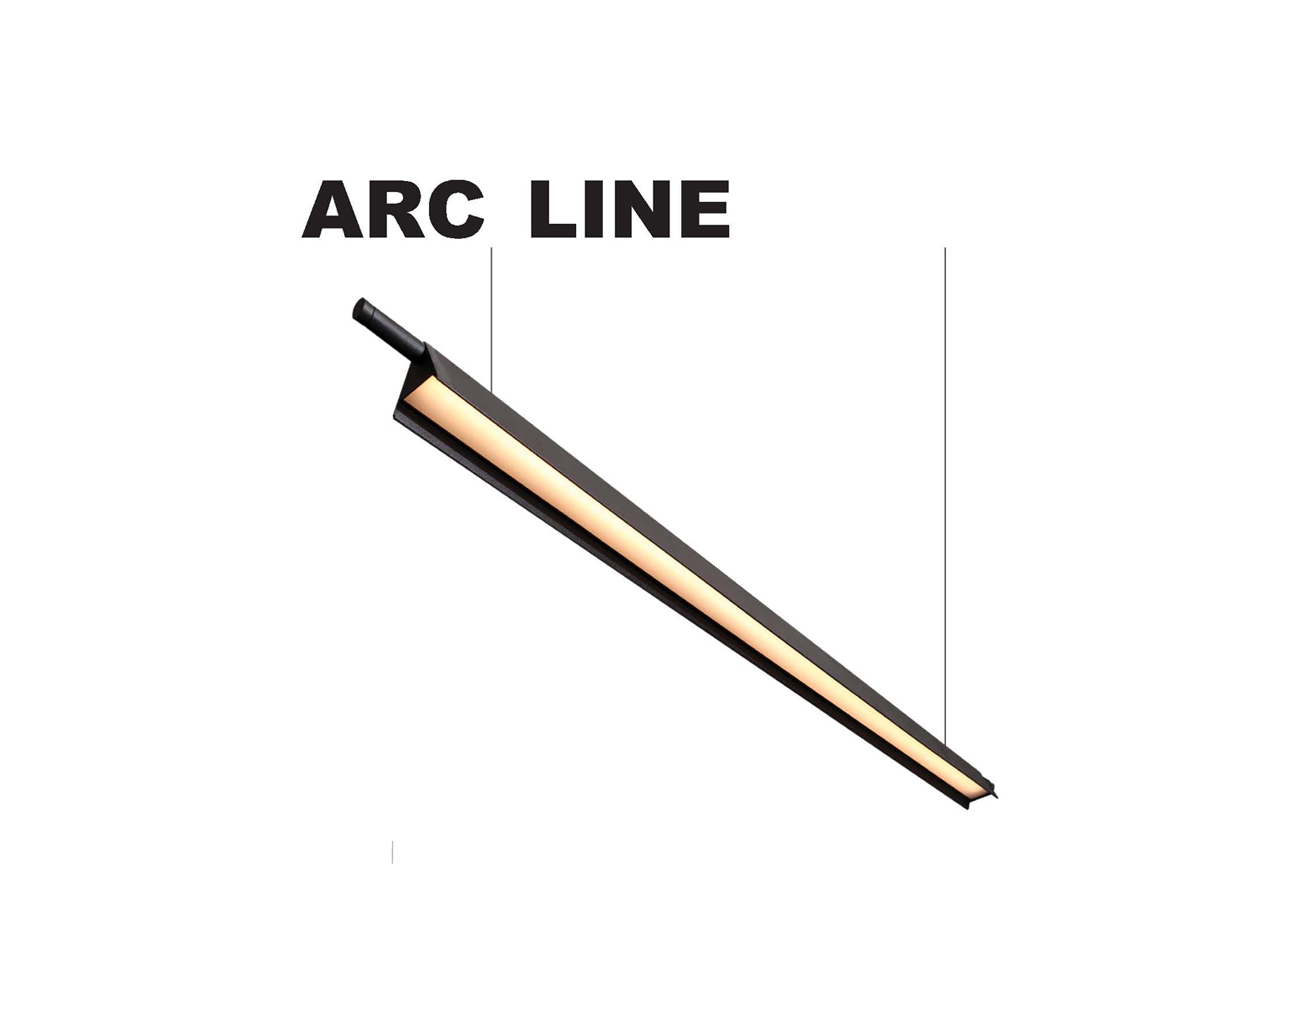 ARC Line